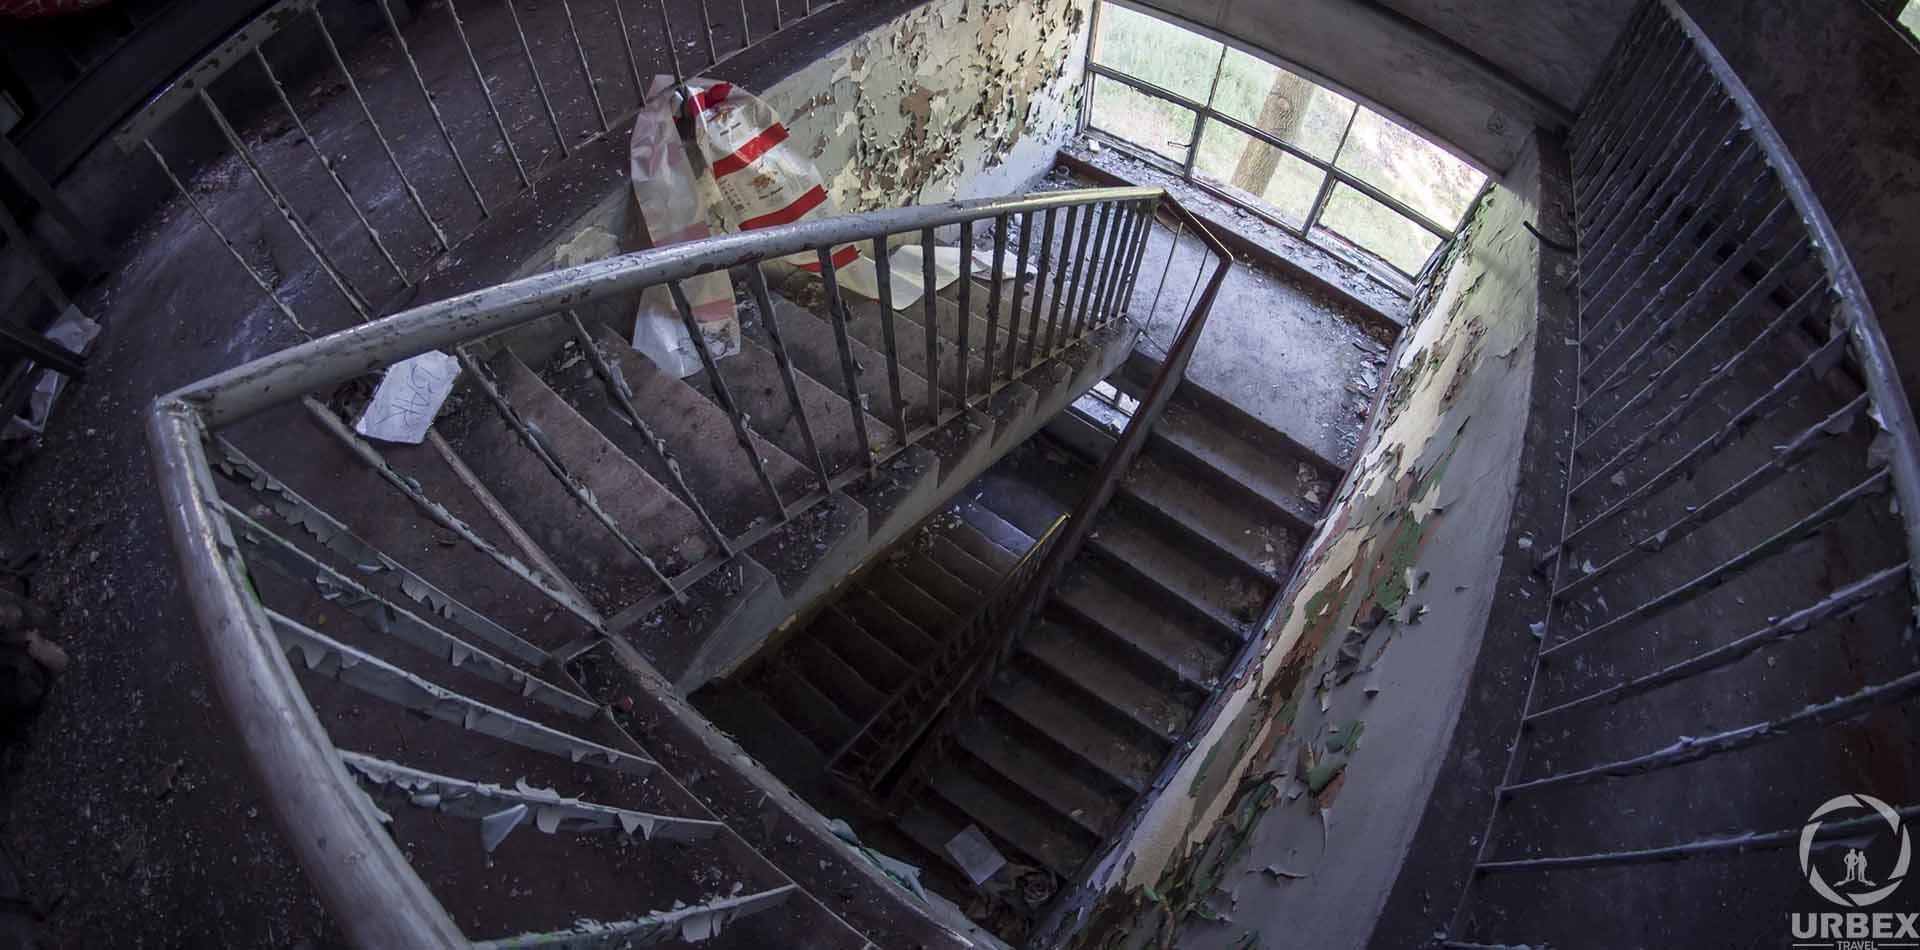 Stairs in Abandoned Boiler Room in Zielonka